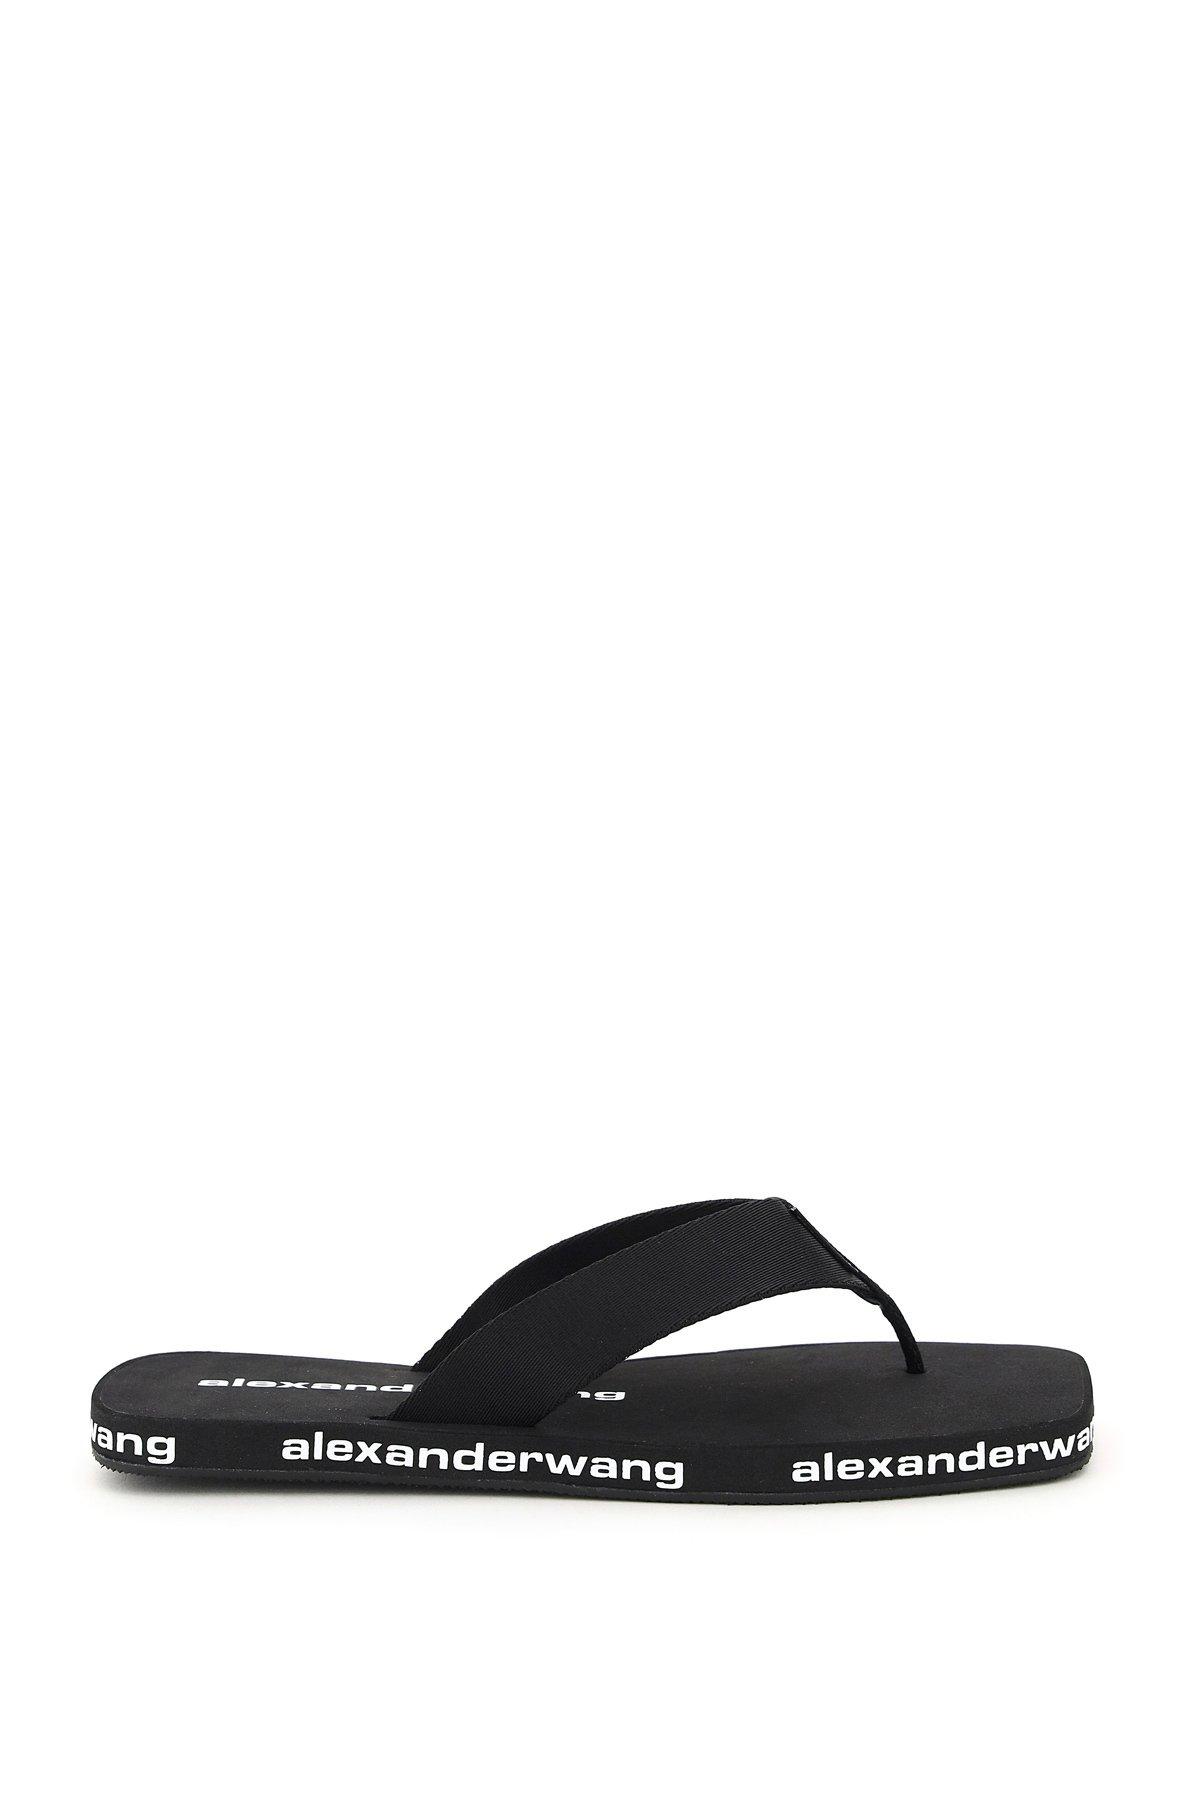 Alexander wang infradito in nylon